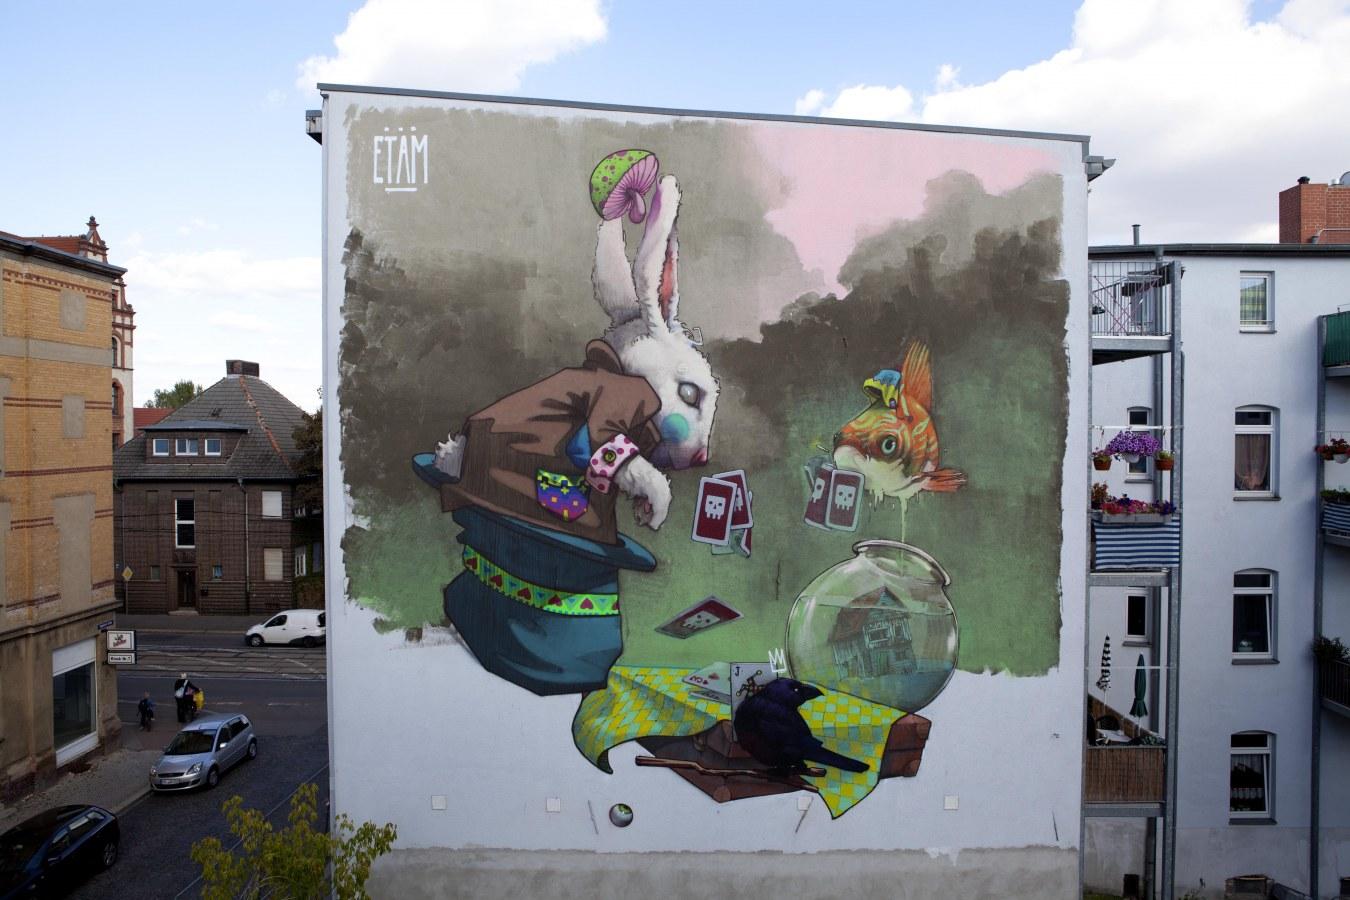 etam-cru-bezt-sainer-street-art-large-murals-14